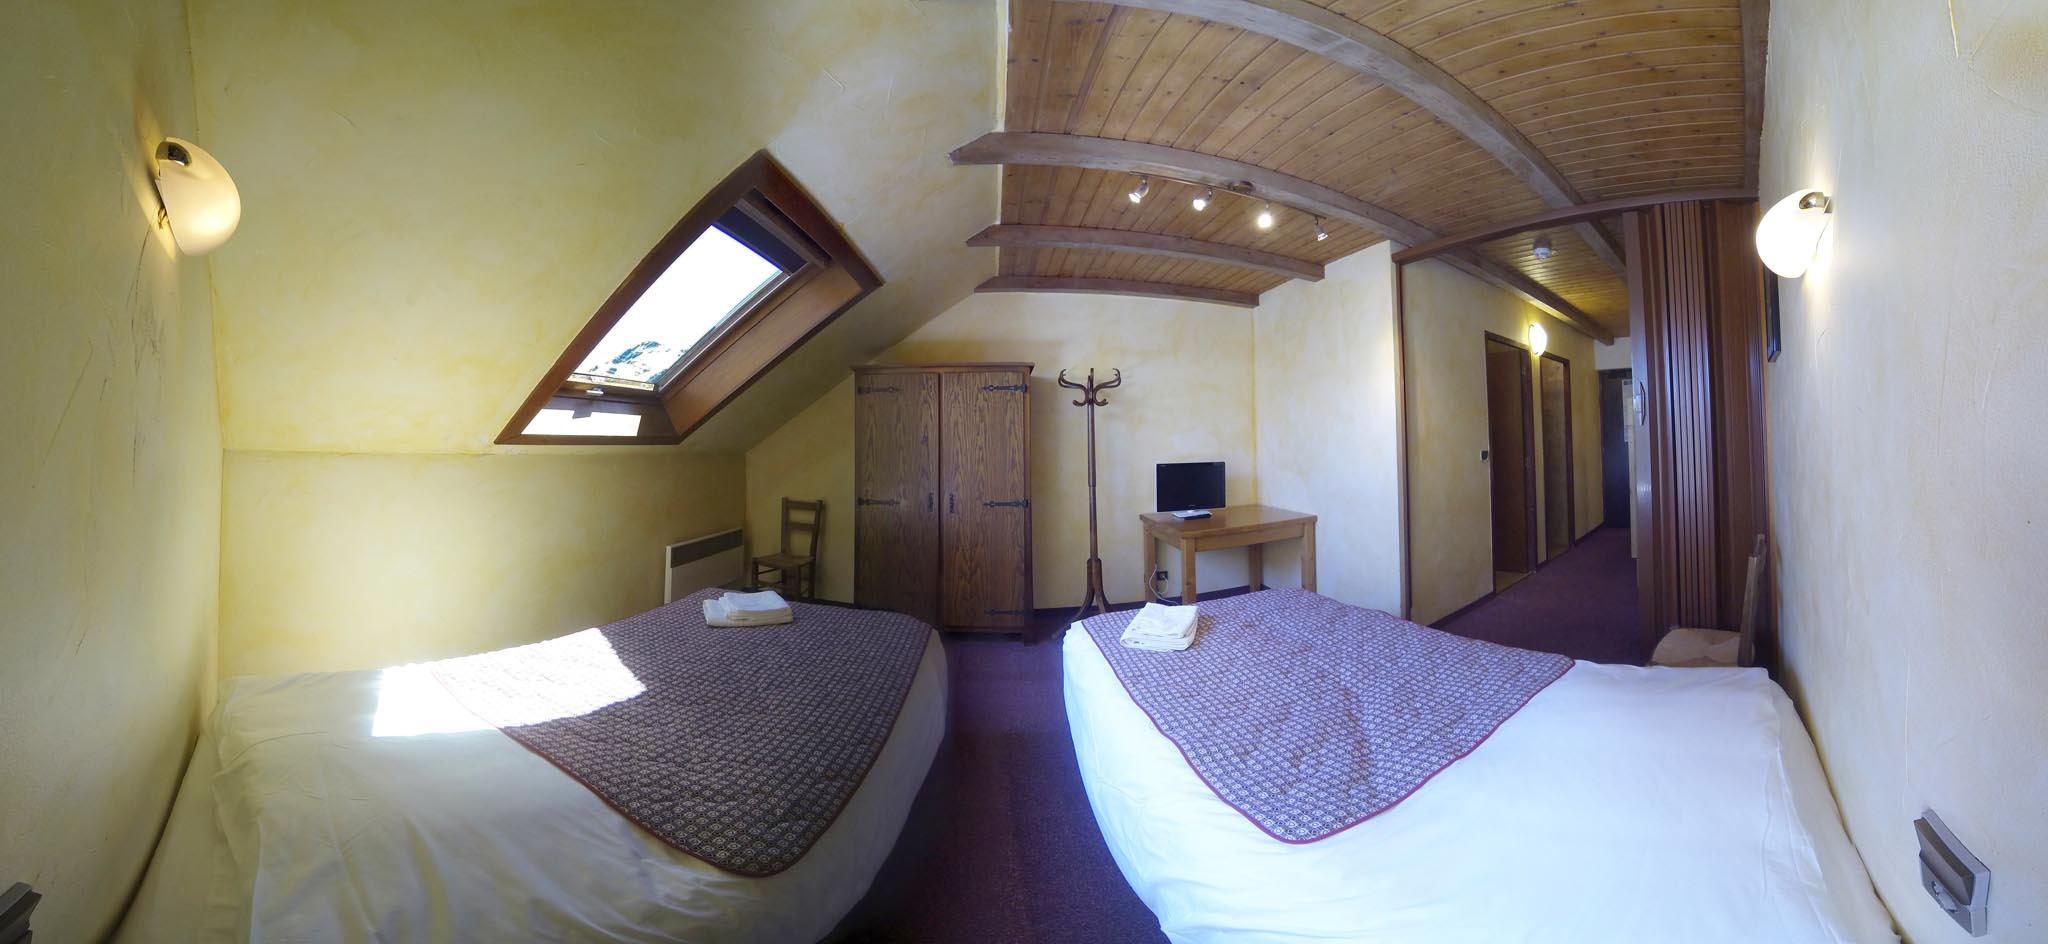 Chambre n 15 2 lits simples 2 lits superpos s douche et for Chambre 2 lits